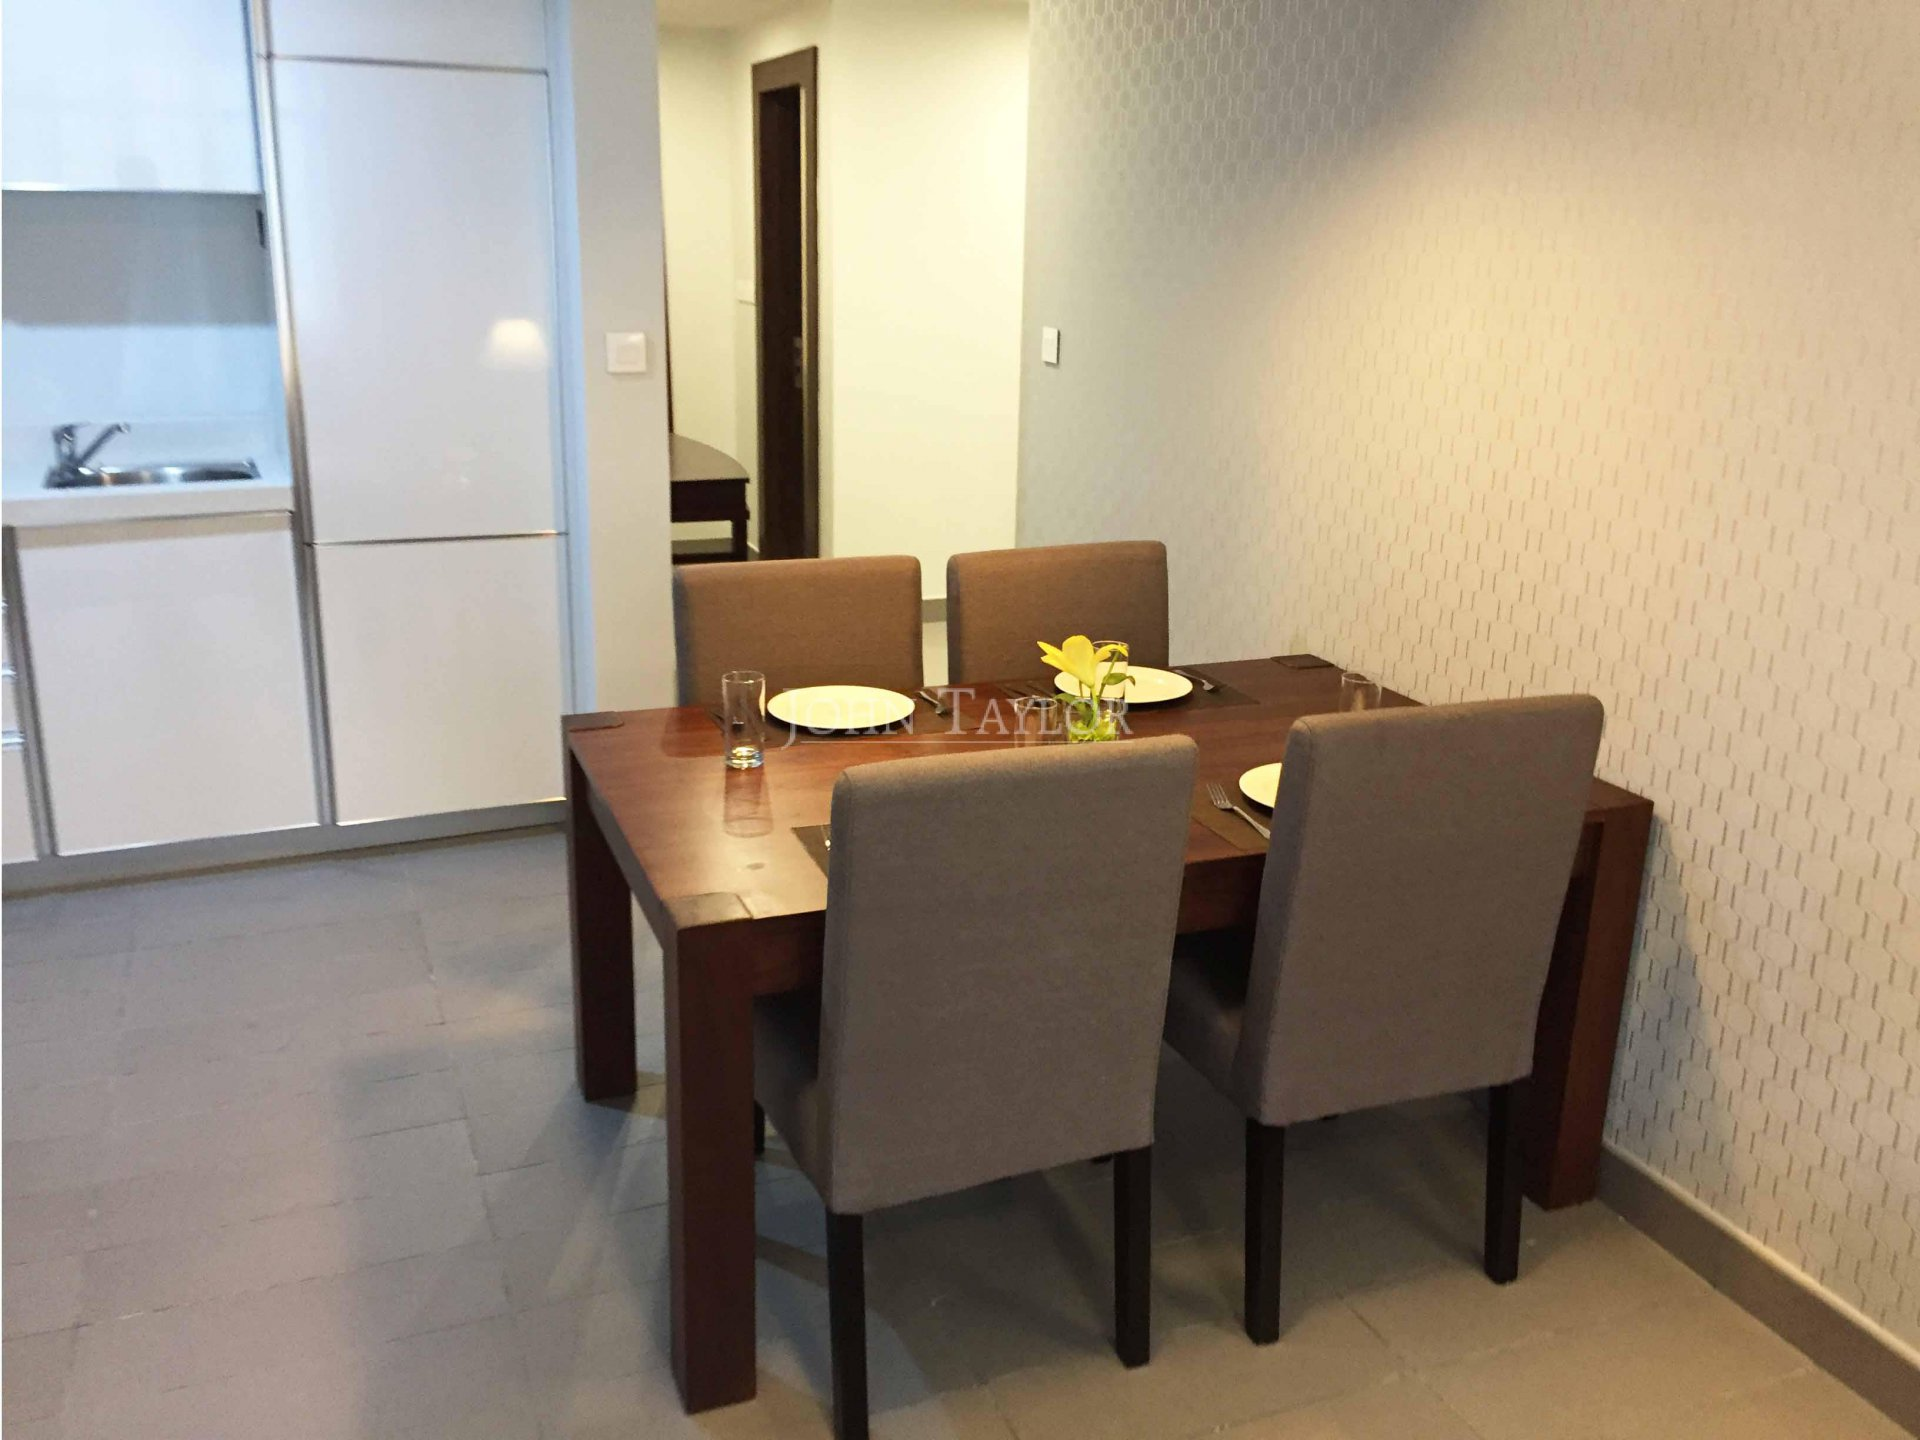 Ad Rental Apartment Doha 1 Rooms 70 M John Taylor